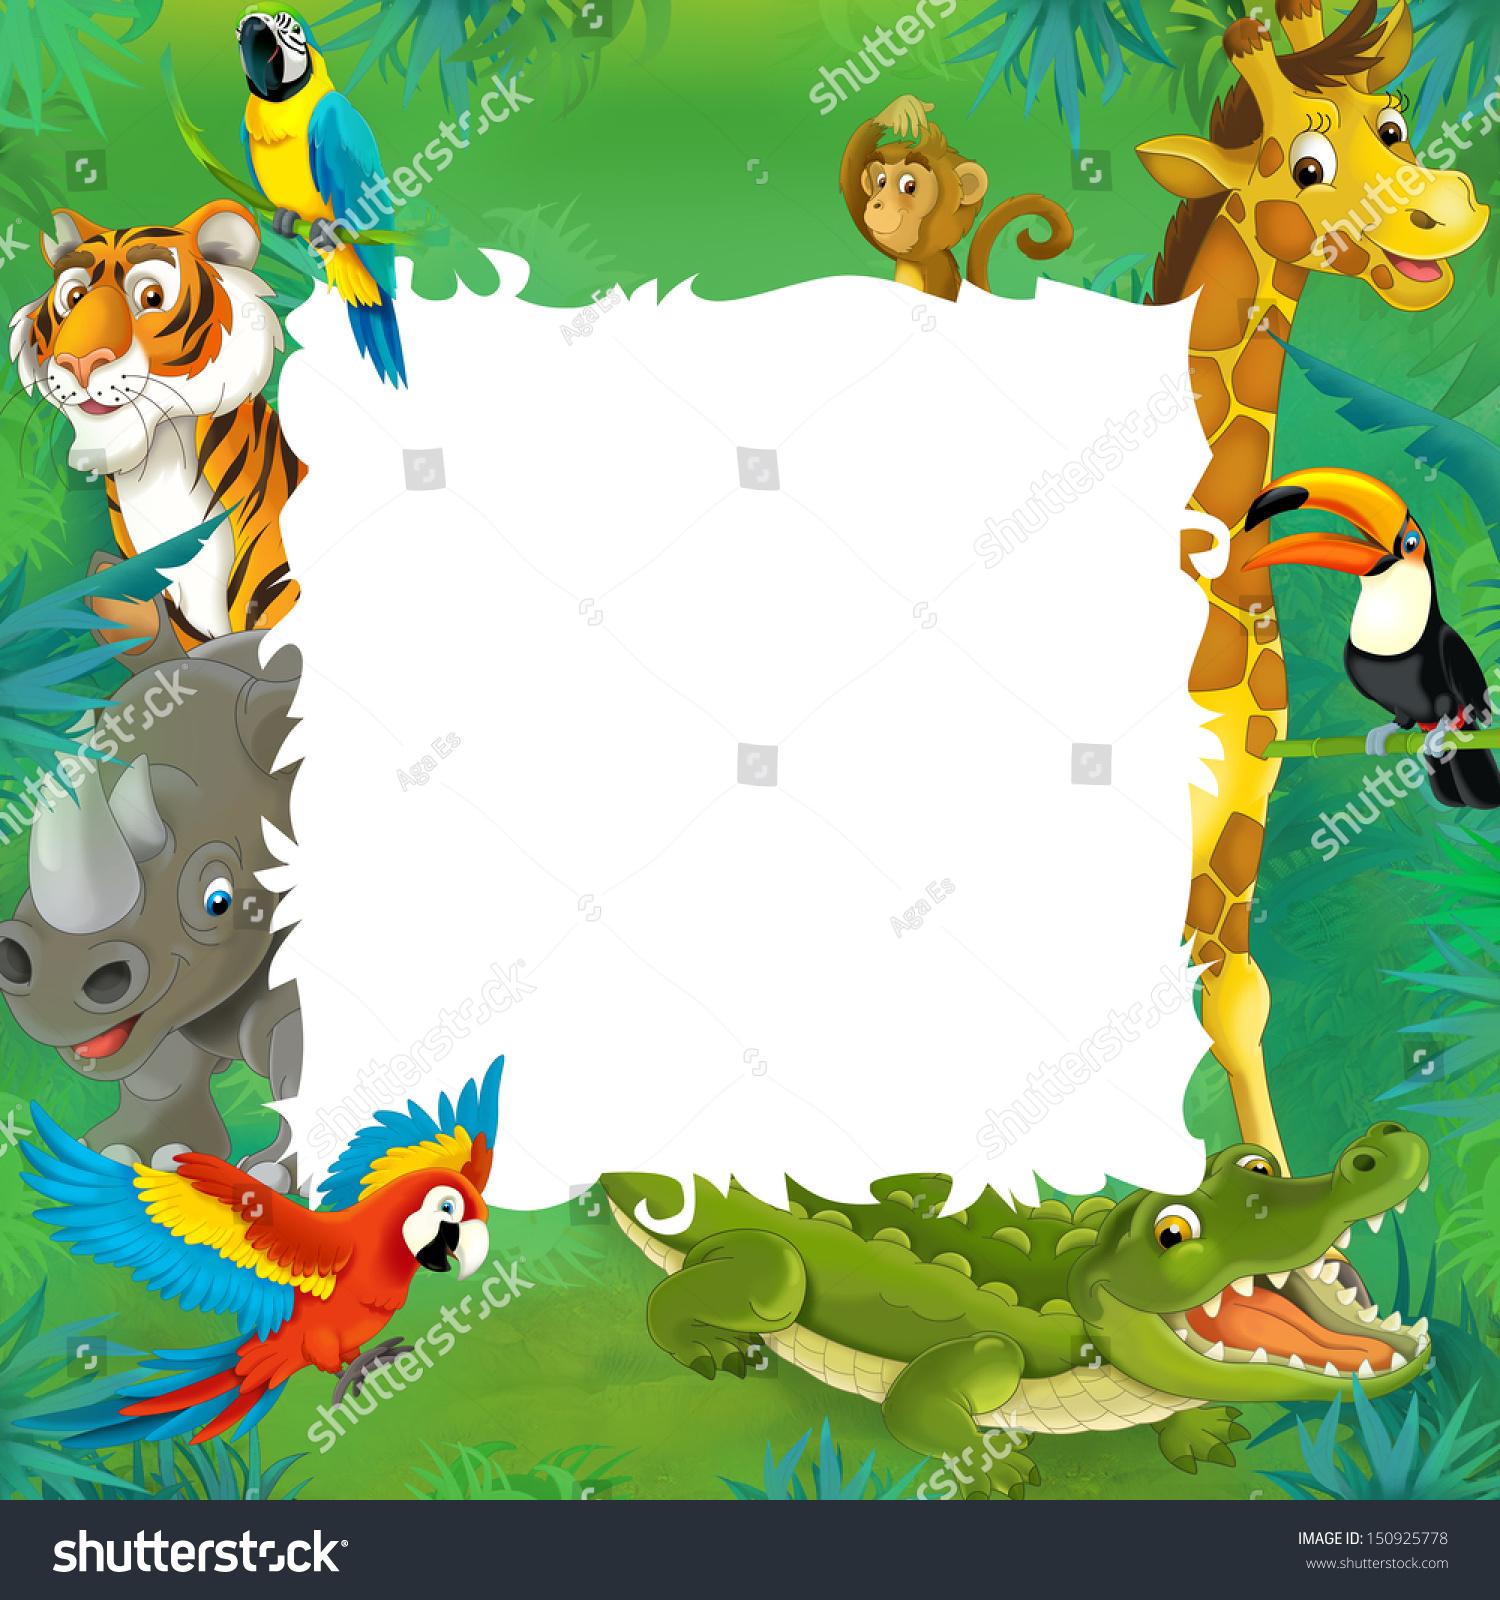 Royalty-free Cartoon safari - jungle - frame border… #150925778 ...